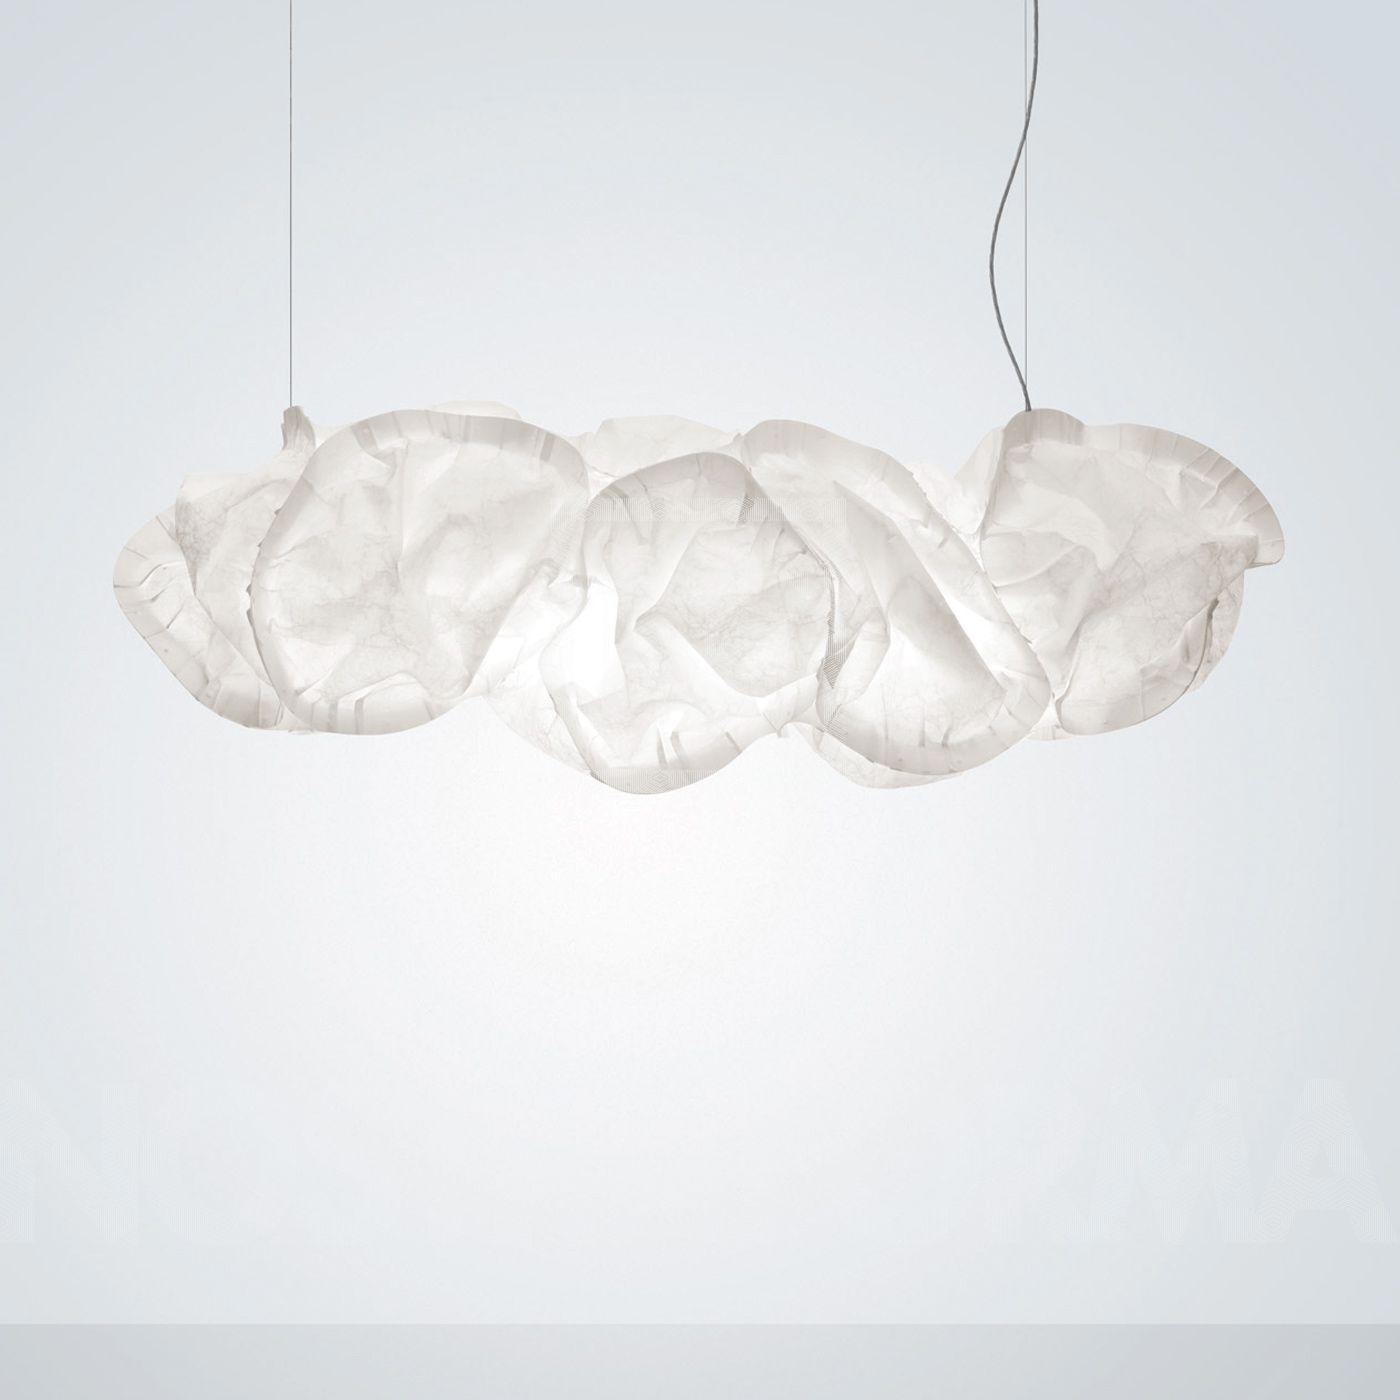 Huge Cloud Like Formation Light Fixtures In Fiber Paper